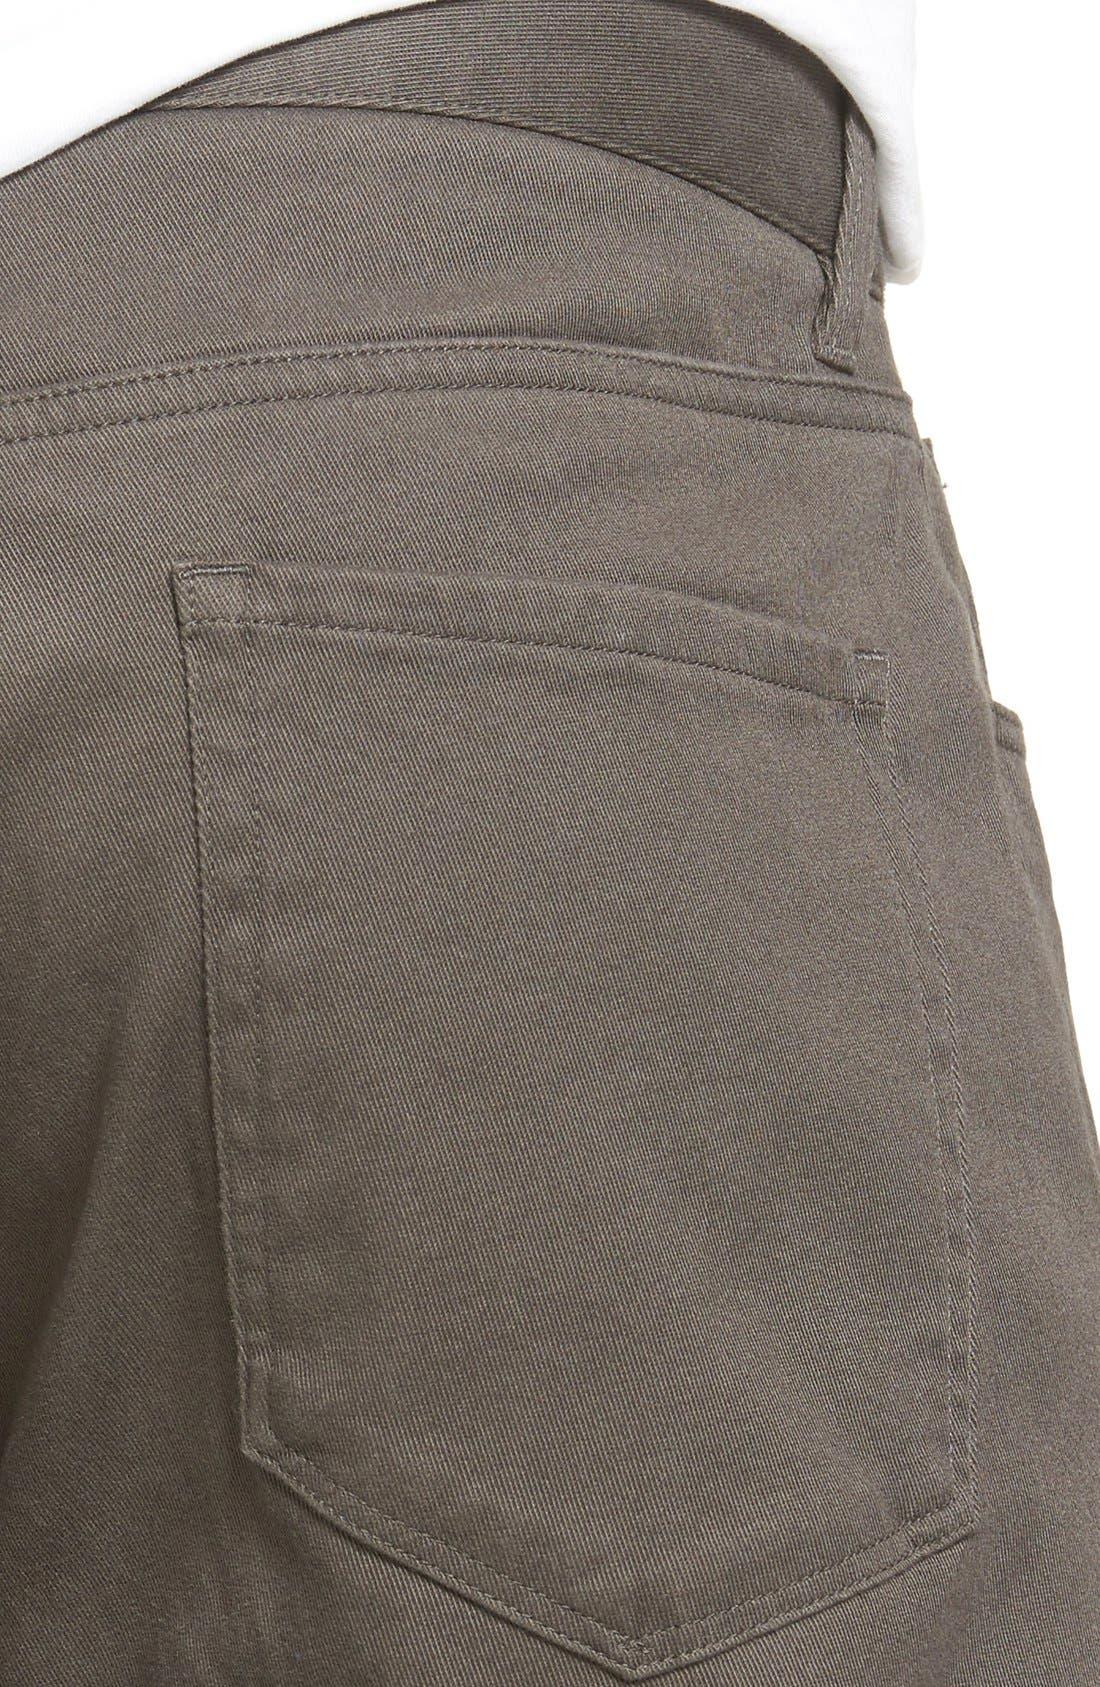 Soho Slim Fit Five-Pocket Pants,                             Alternate thumbnail 5, color,                             GREY